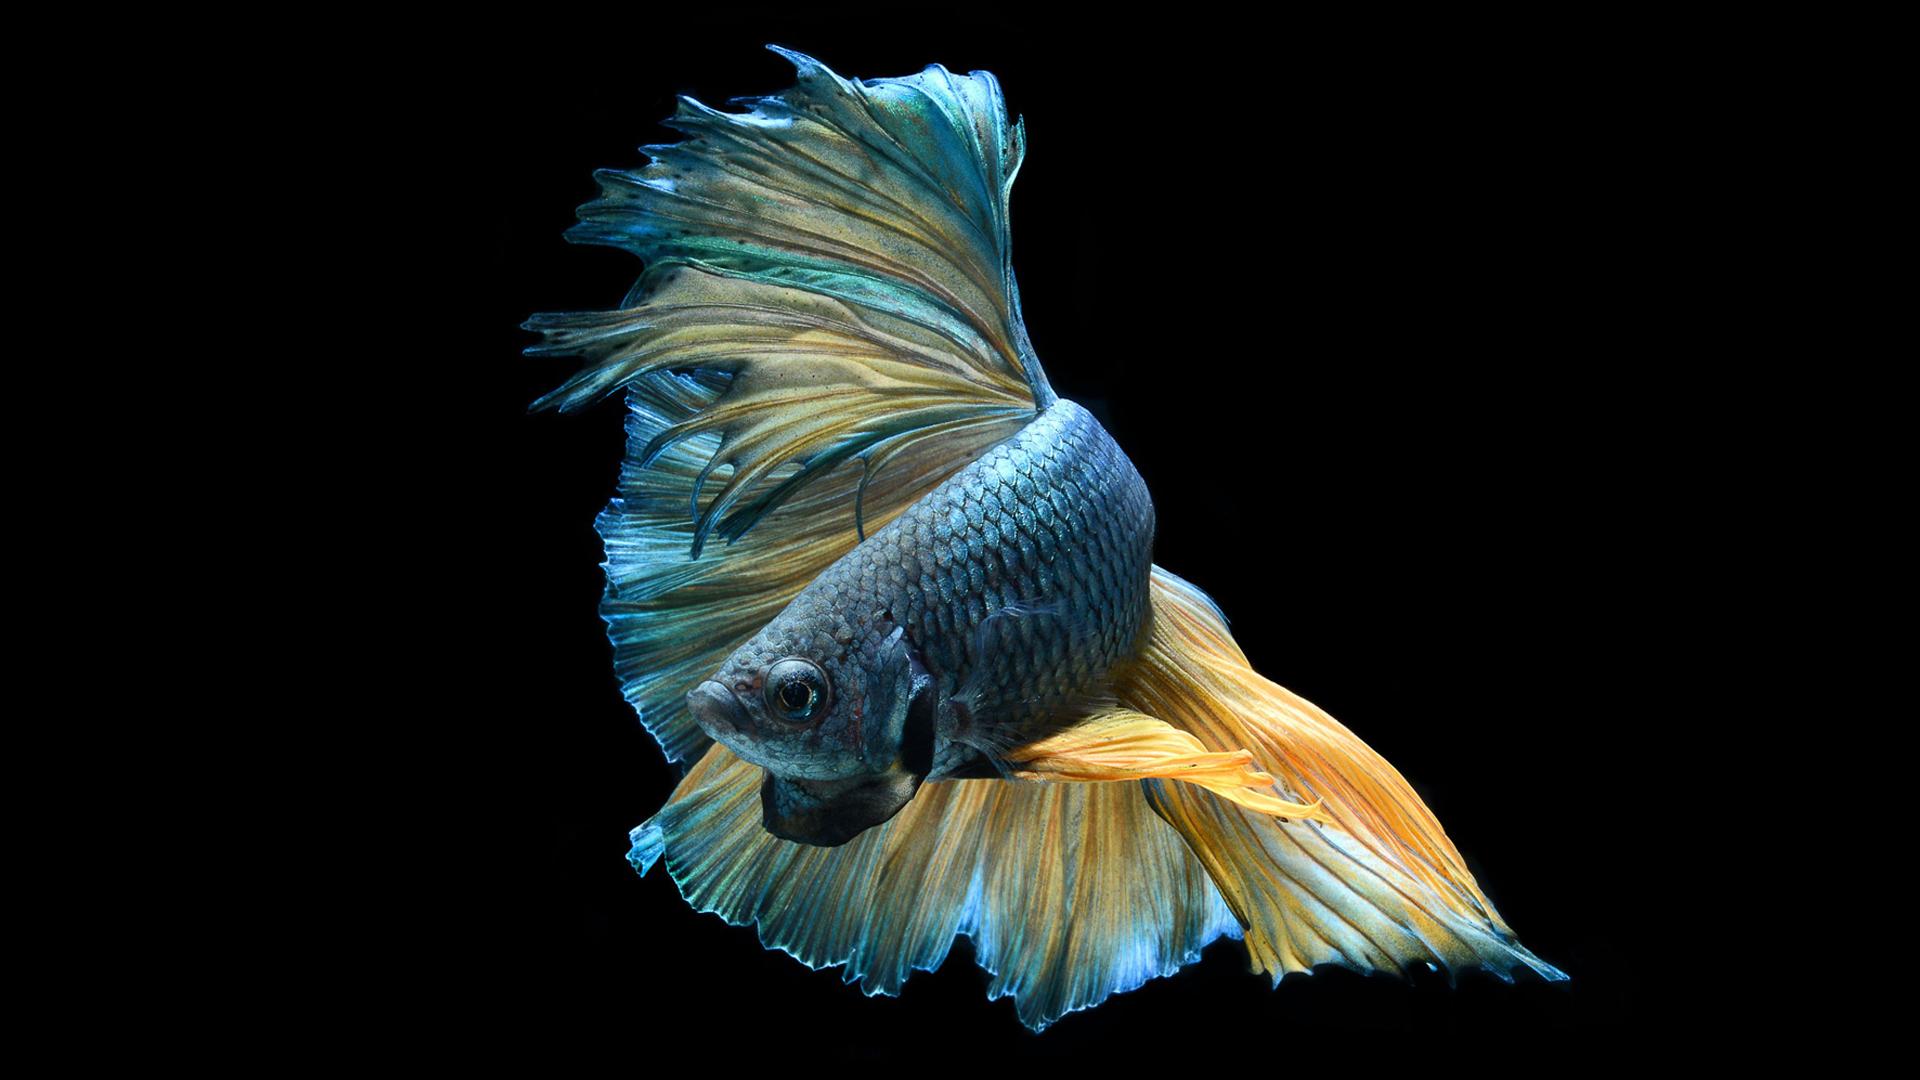 Fish 3d Live Wallpaper Download Halfmoon Betta Wallpaper 5 Of 7 Blue And Yellow Halfmoon